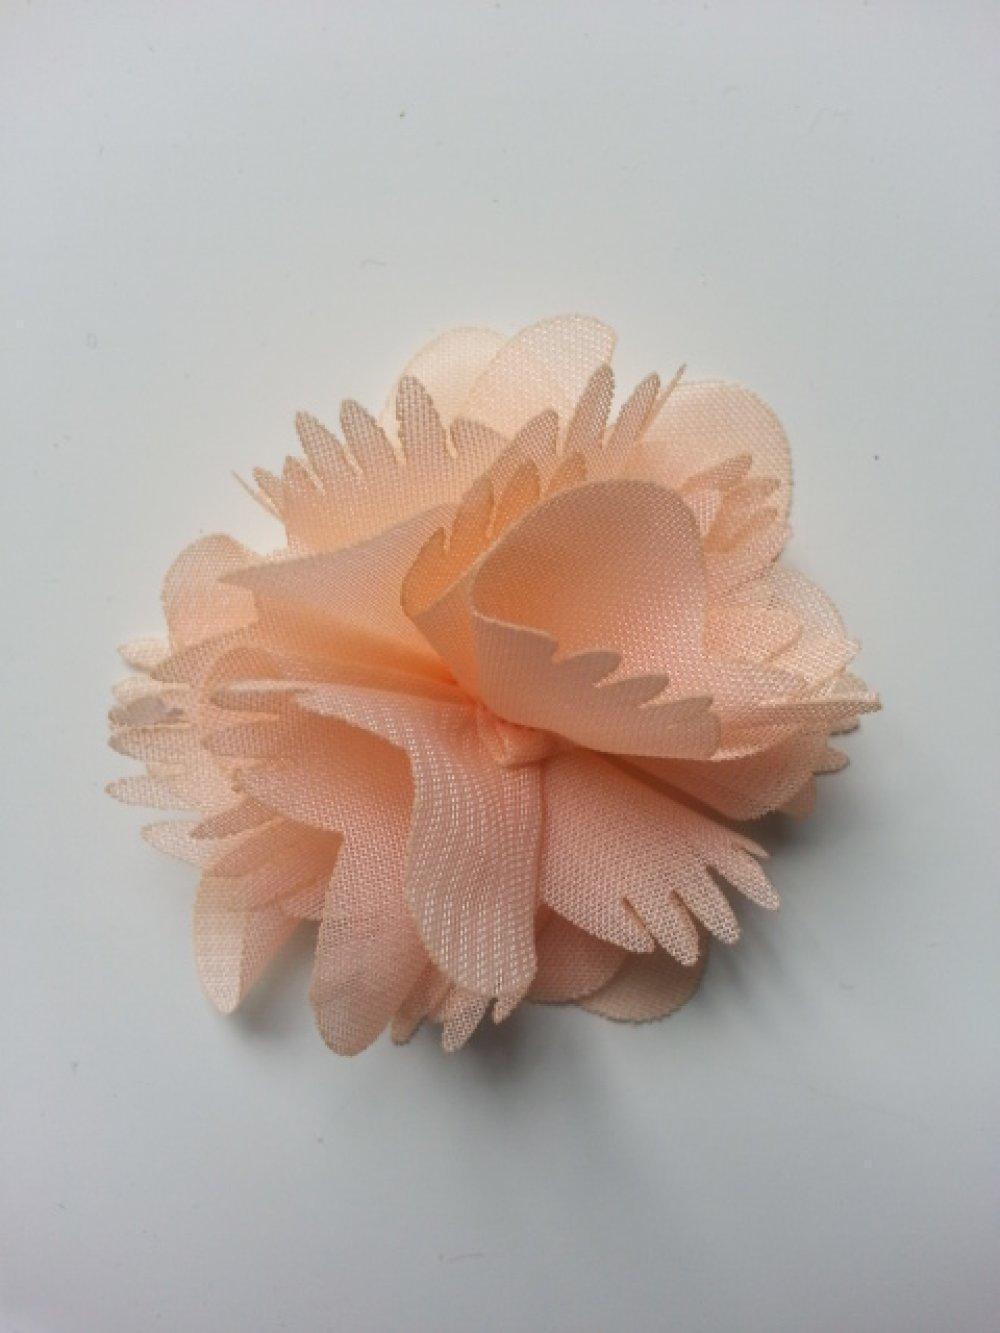 2863287 petite fleur en tissu peche 4 5cm 1